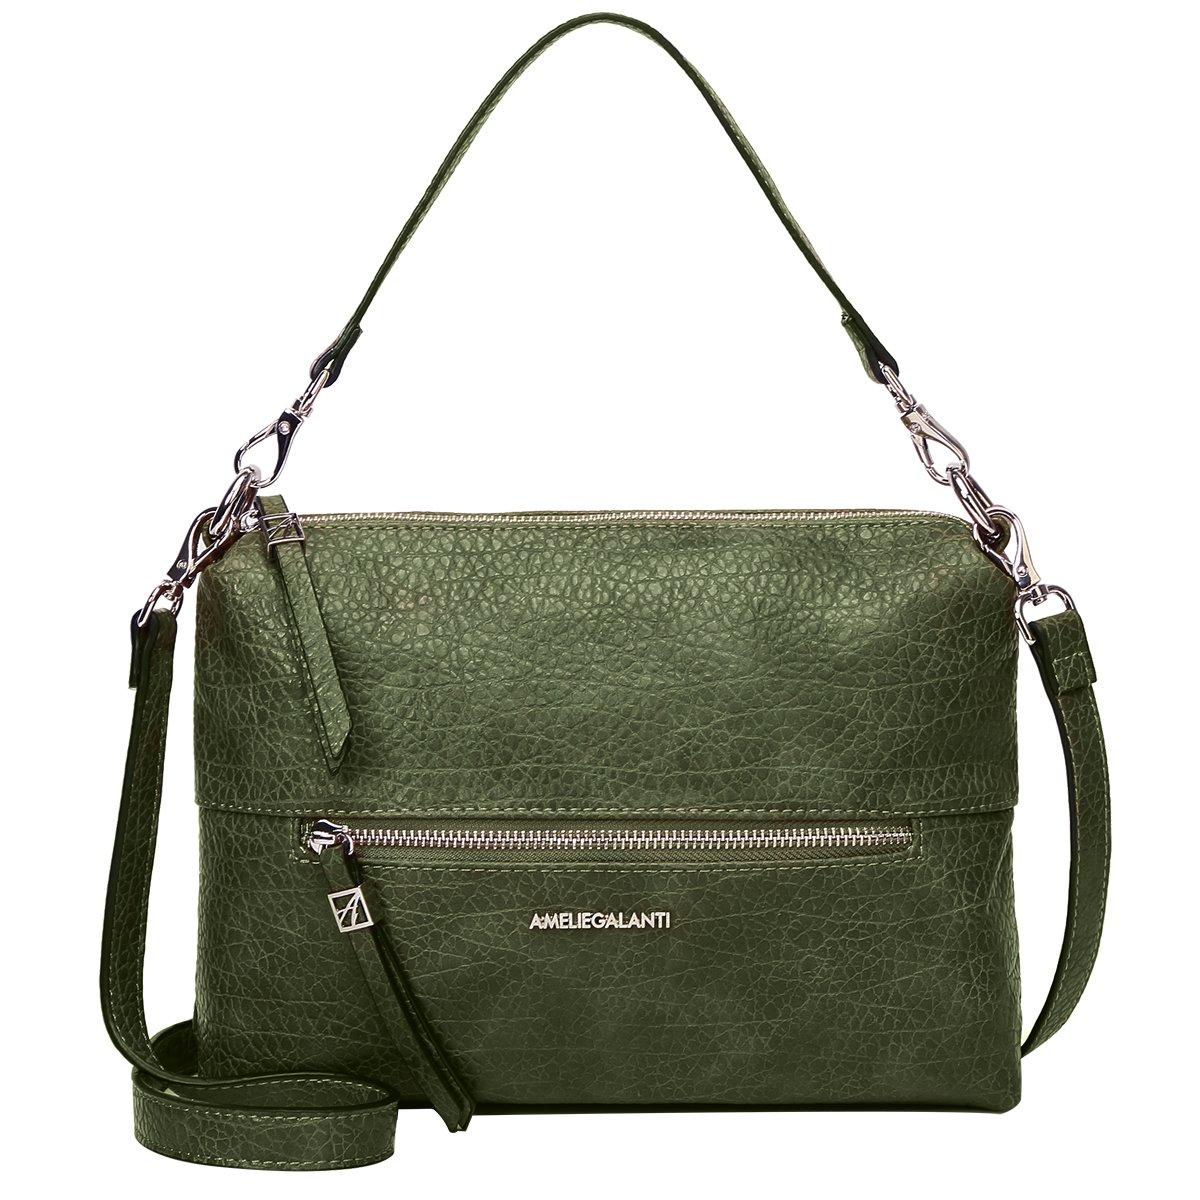 Medium Handbags Simple Shoulder Bags for Women Casual Satchel